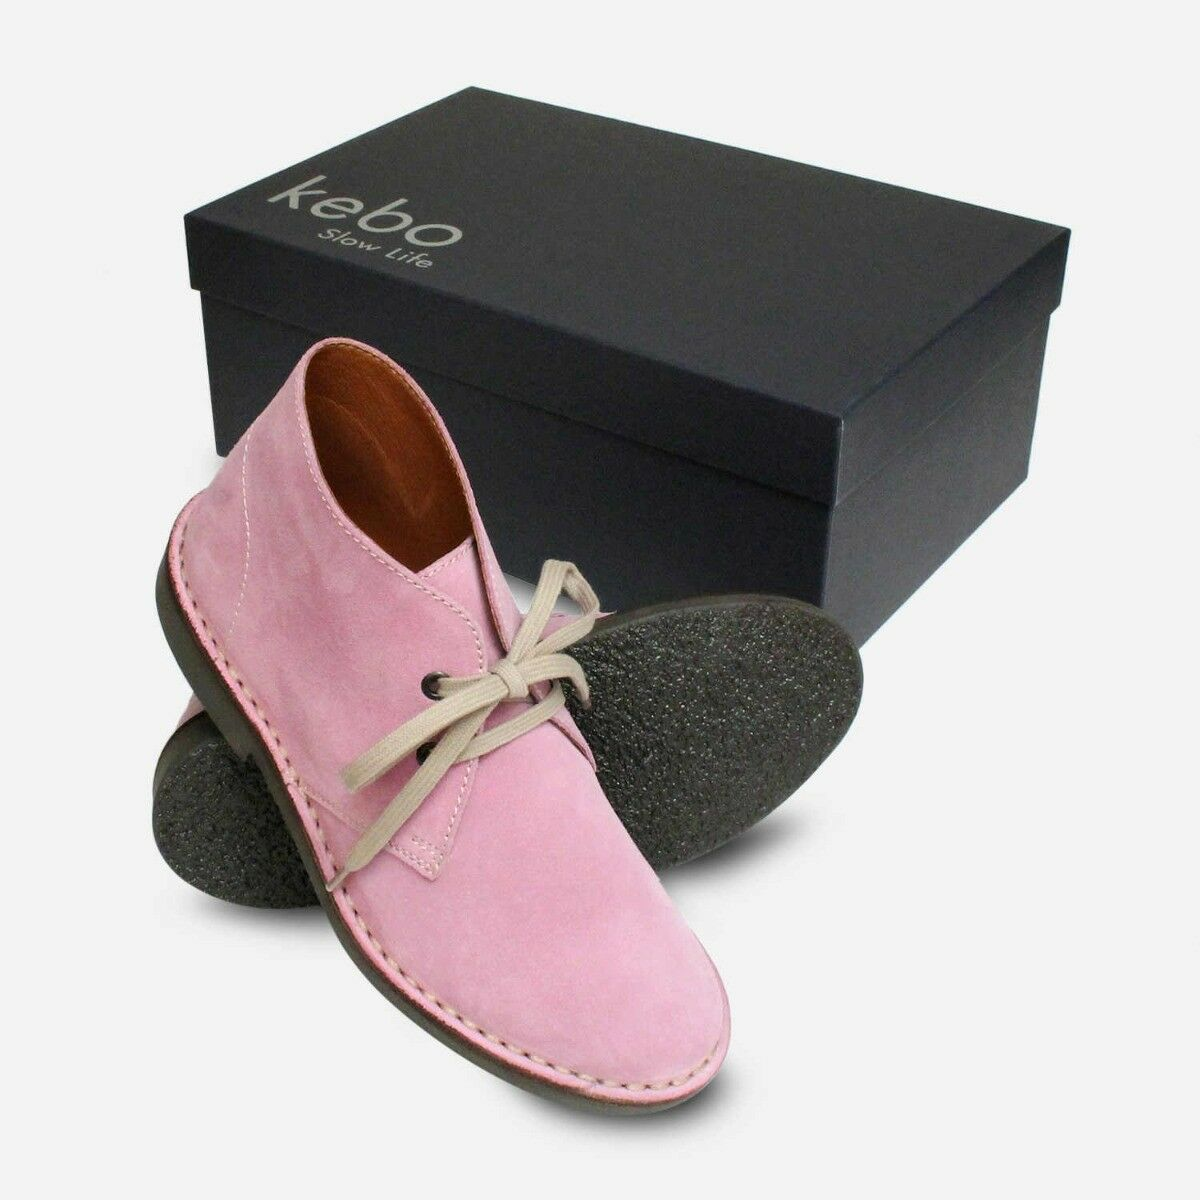 púrpura Gamuza Señoras botas Con Cordones Cordones Cordones Desierto italiano 28f528